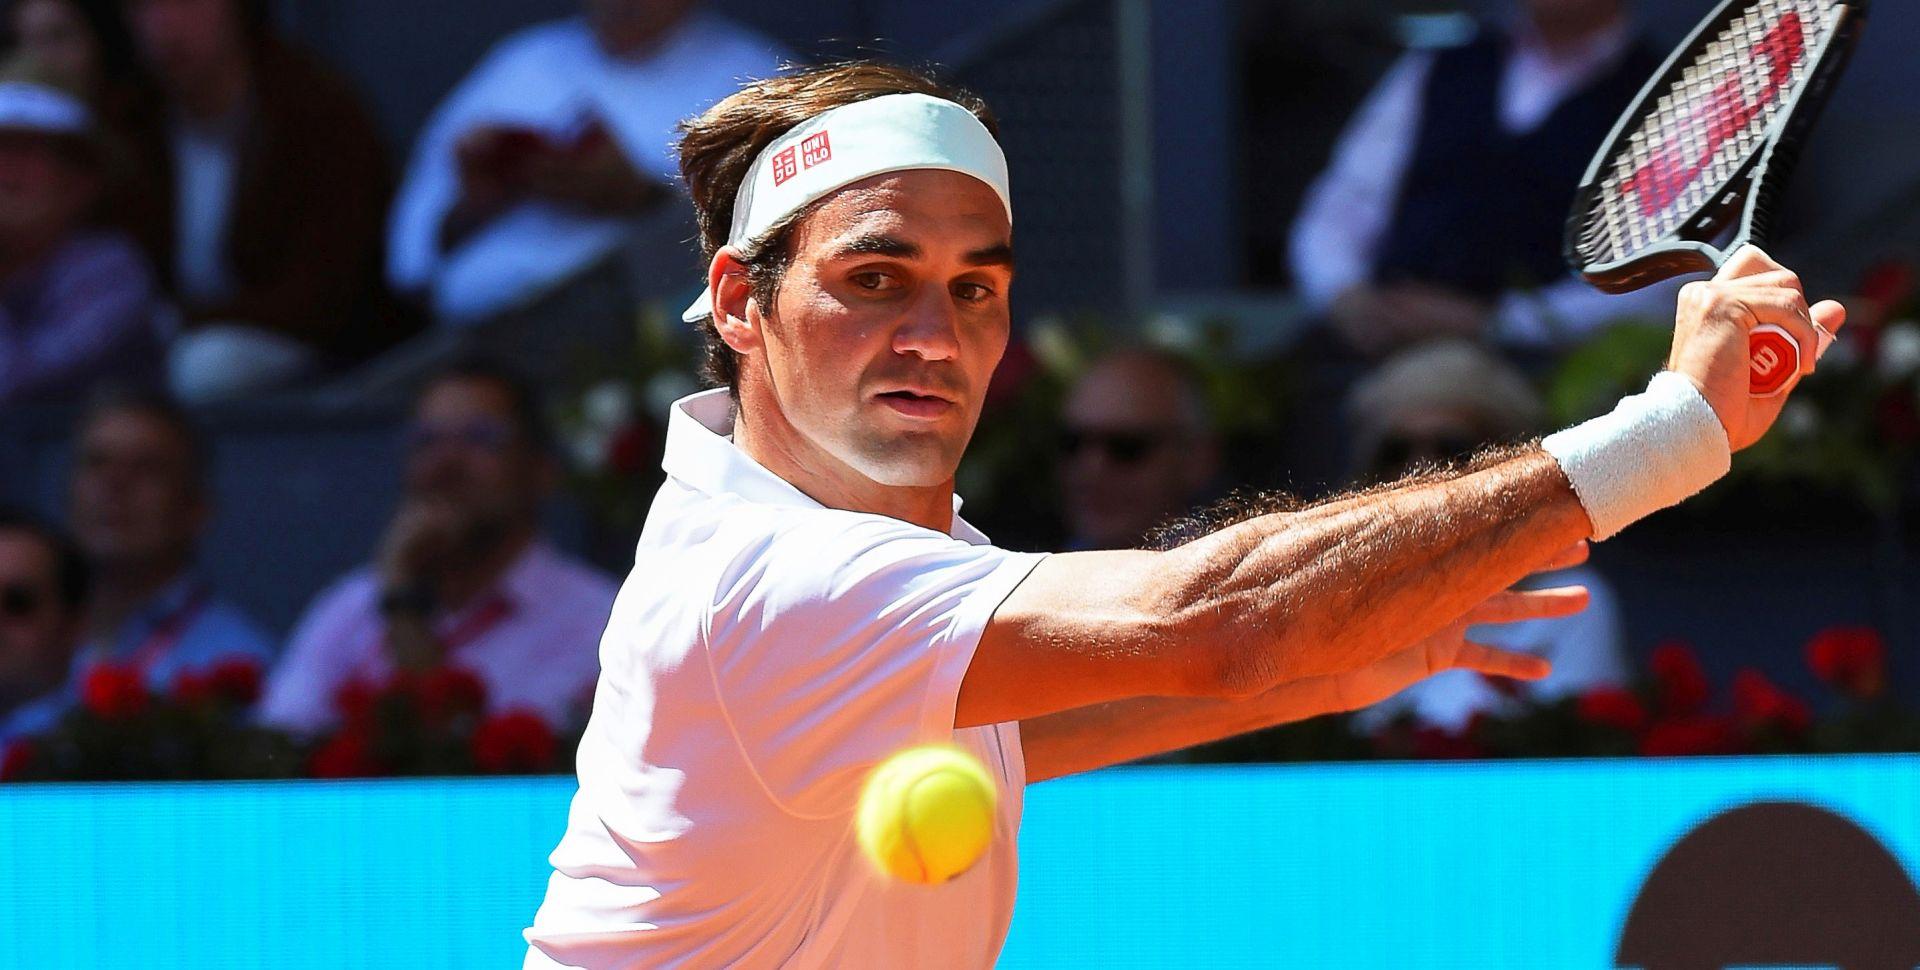 Federer u četiri seta do 100. pobjede u All England Clubu